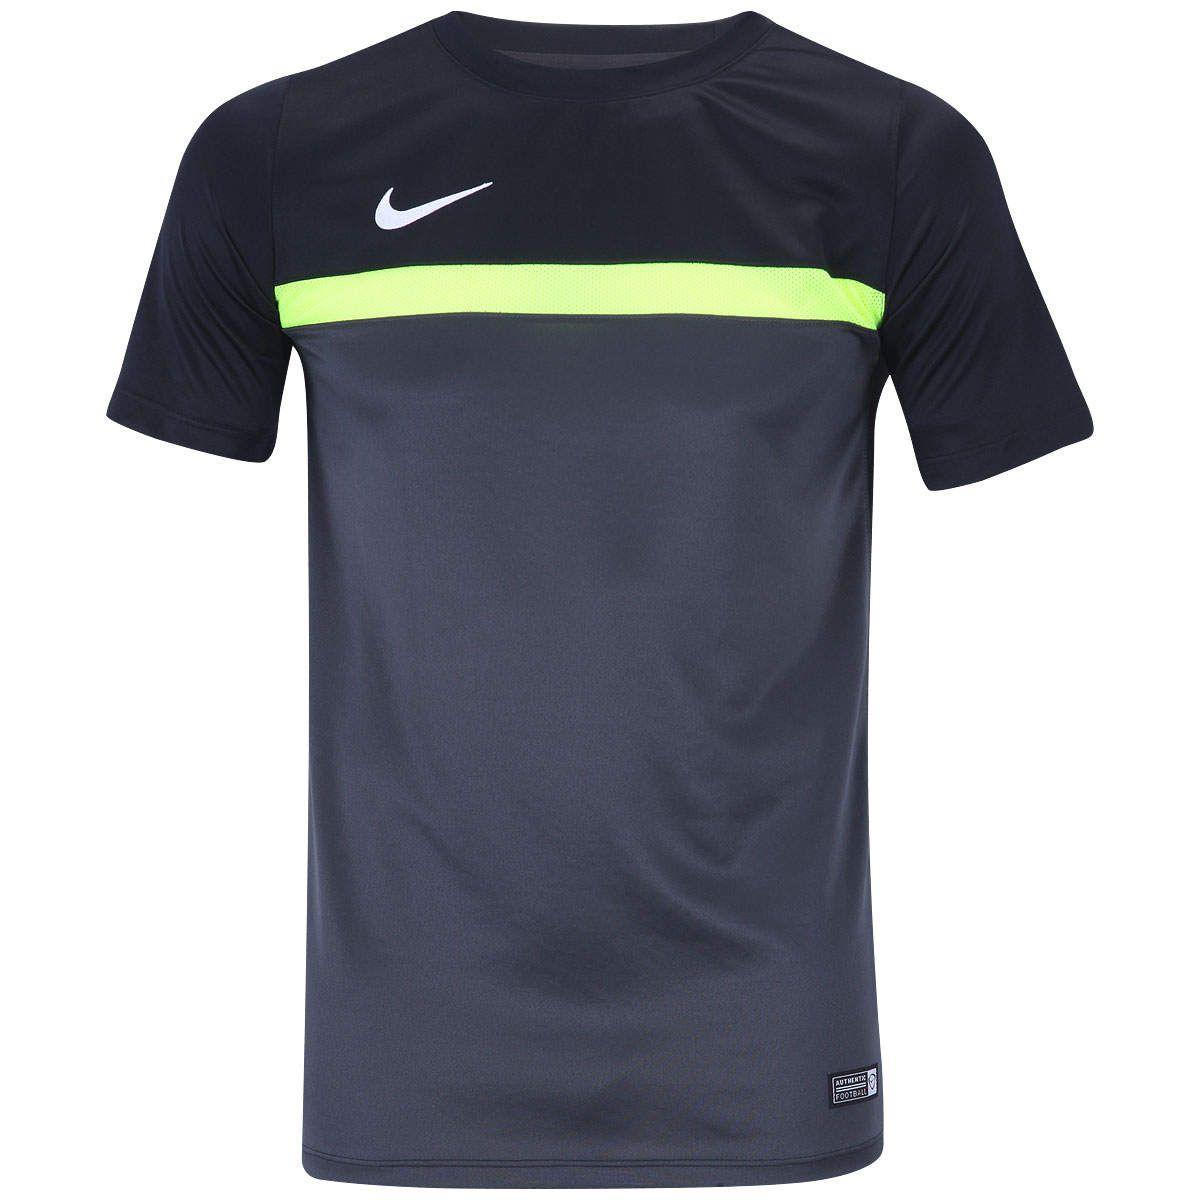 R$59,99 - P, M, G, GG - http://vitrineed.com/43ce #vitrineed #sports #outfits